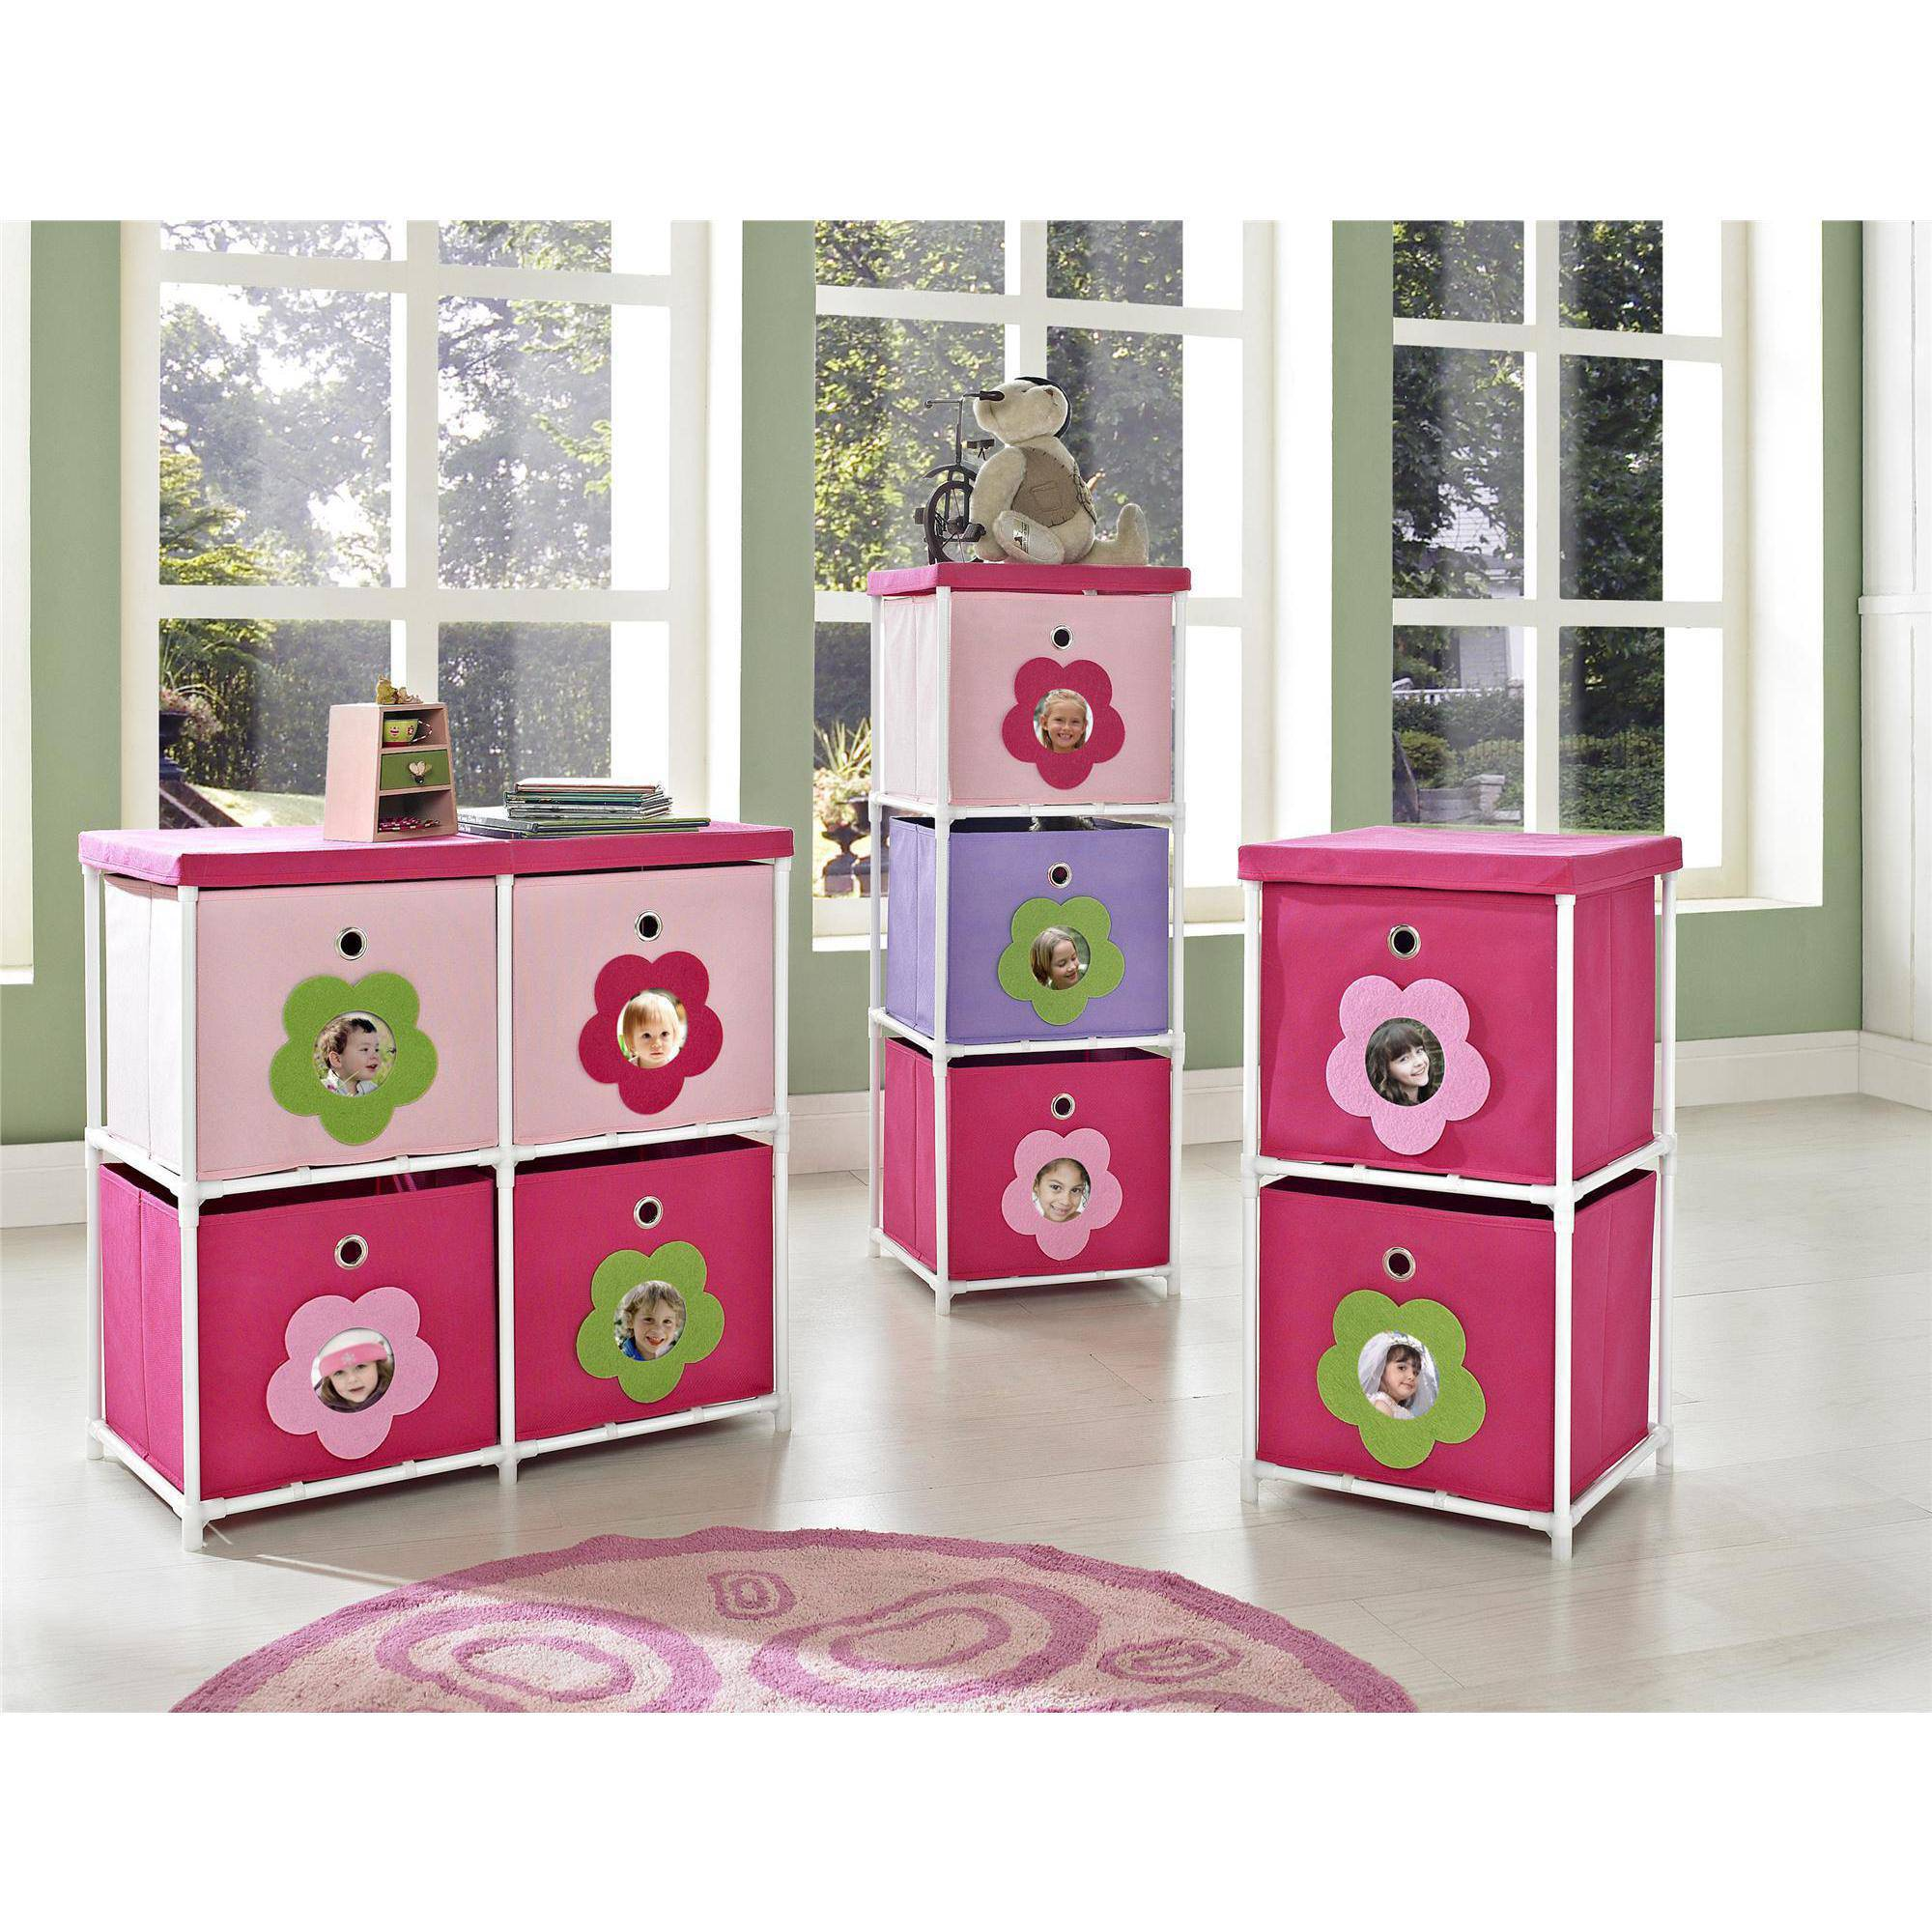 High Quality Altra Furniture Kidsu0027 Bin Storage Unit 12.99L 12.99W 36.02H   Walmart.com